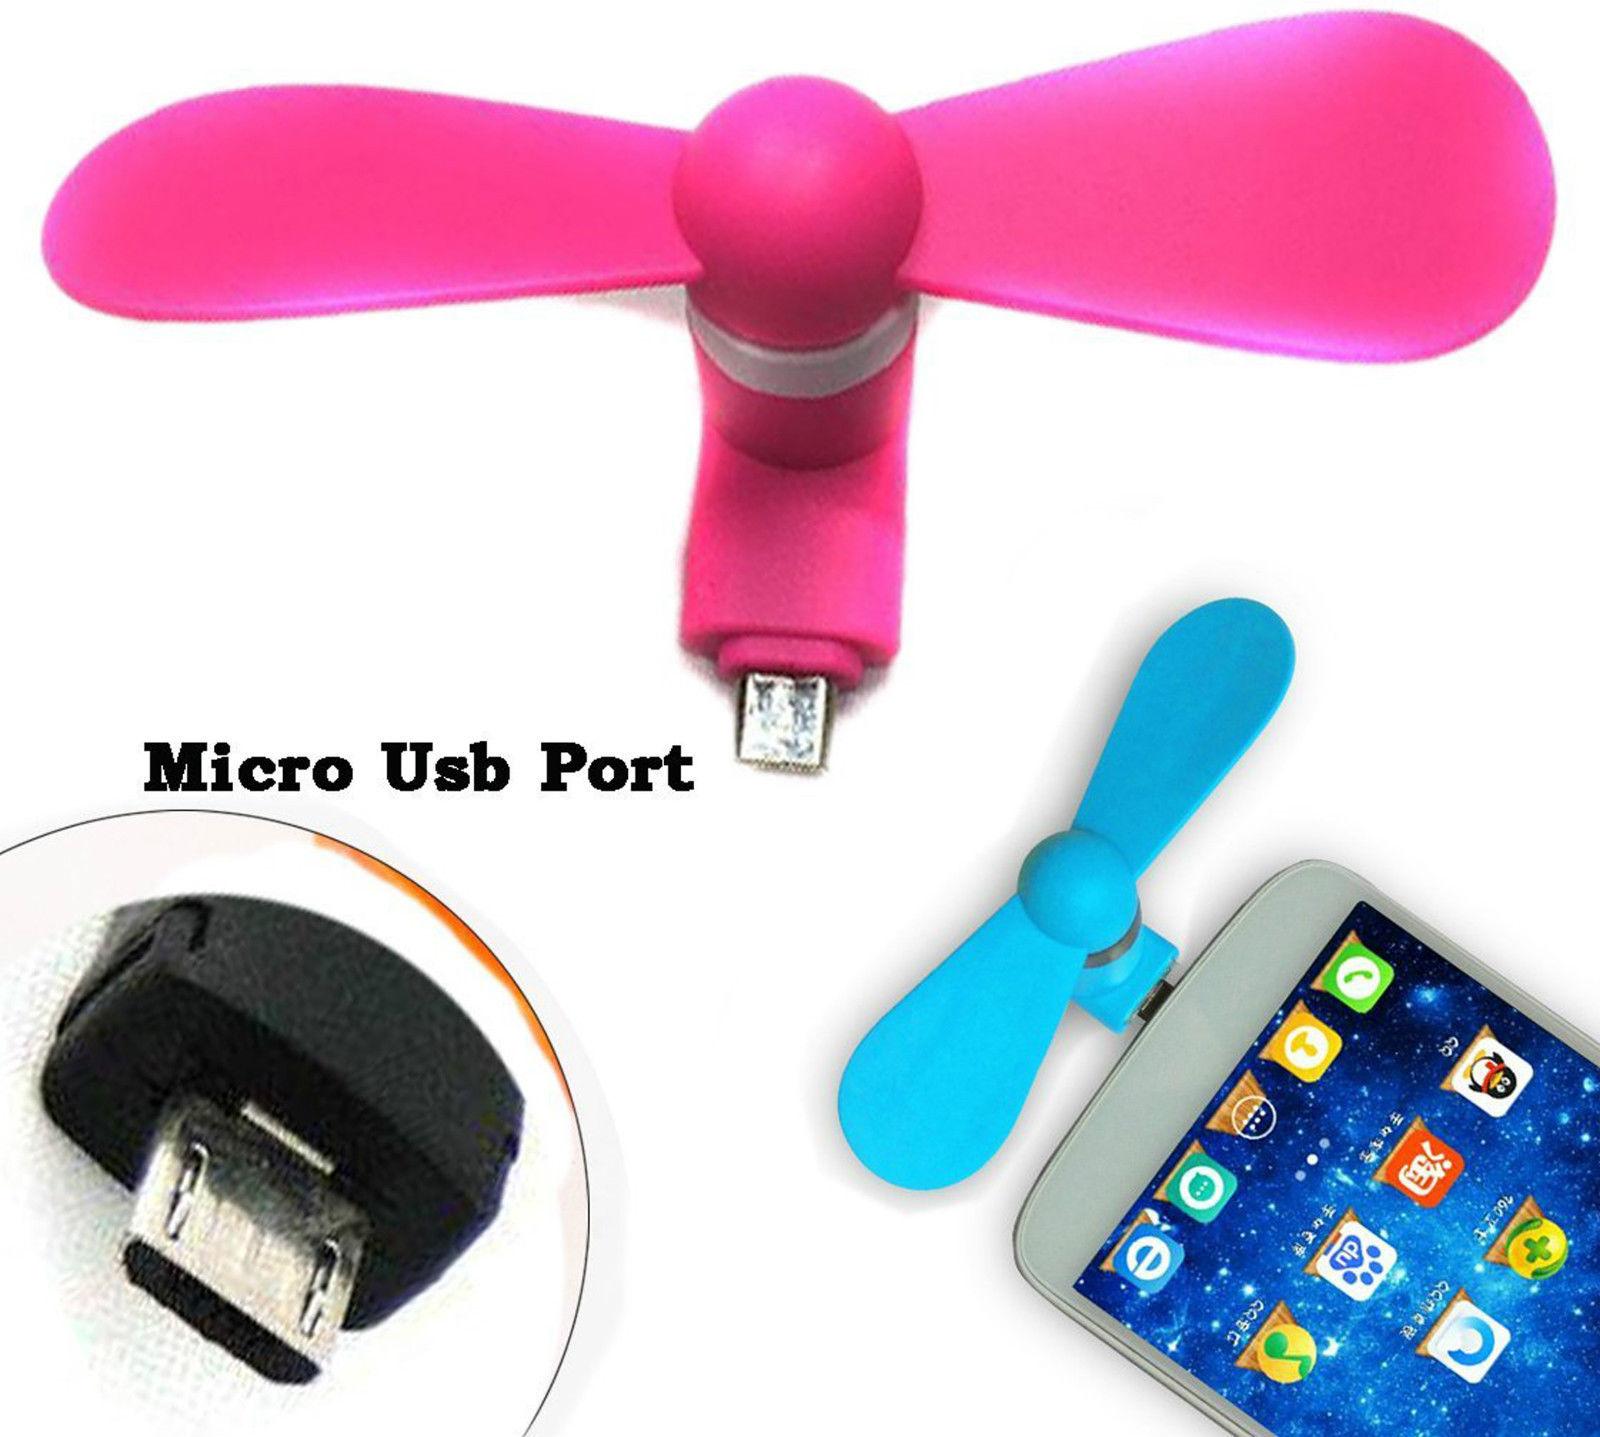 USB FAN   OTG Mini USB Cooling Portable Fan Mobile Cooler For V8 Android OTG Phone